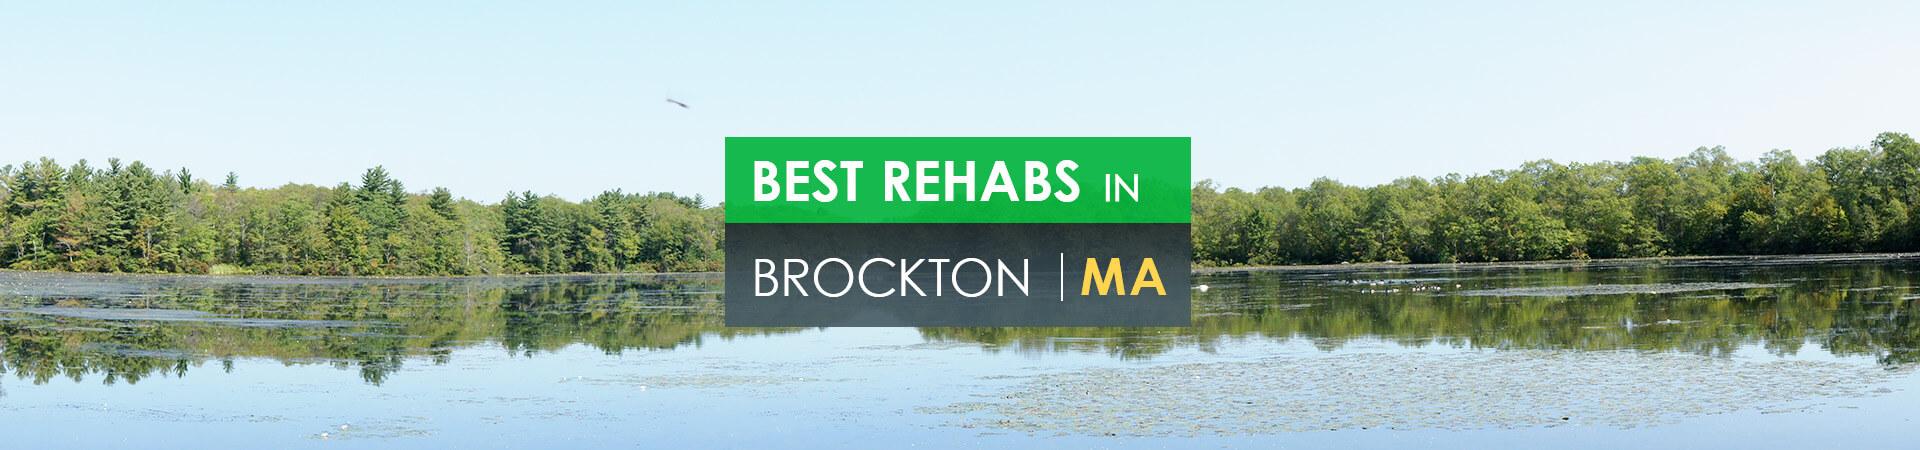 Best rehabs in Brockton, MA